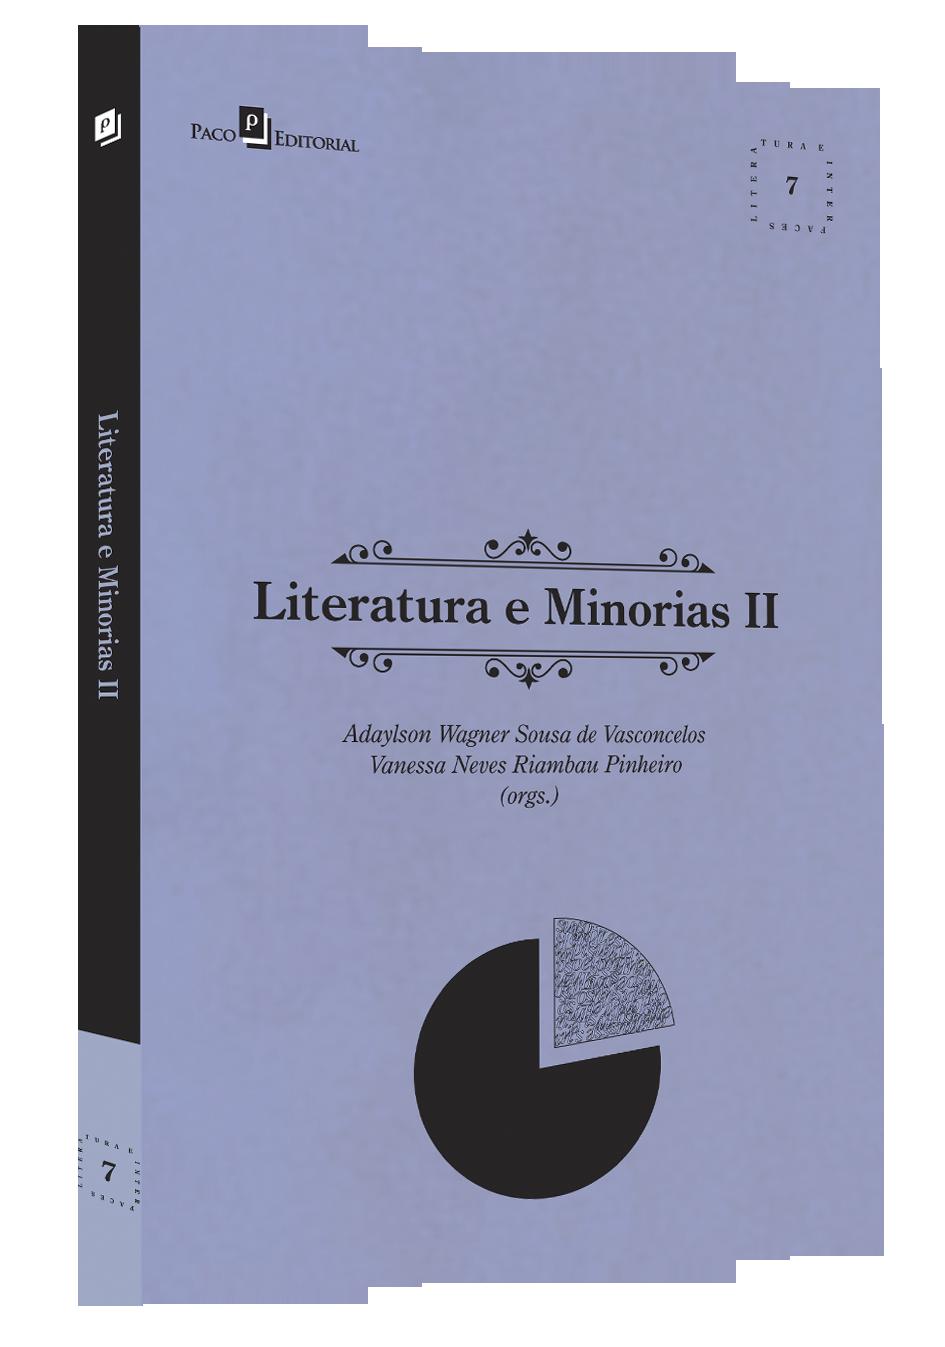 Literatura e Minorias II